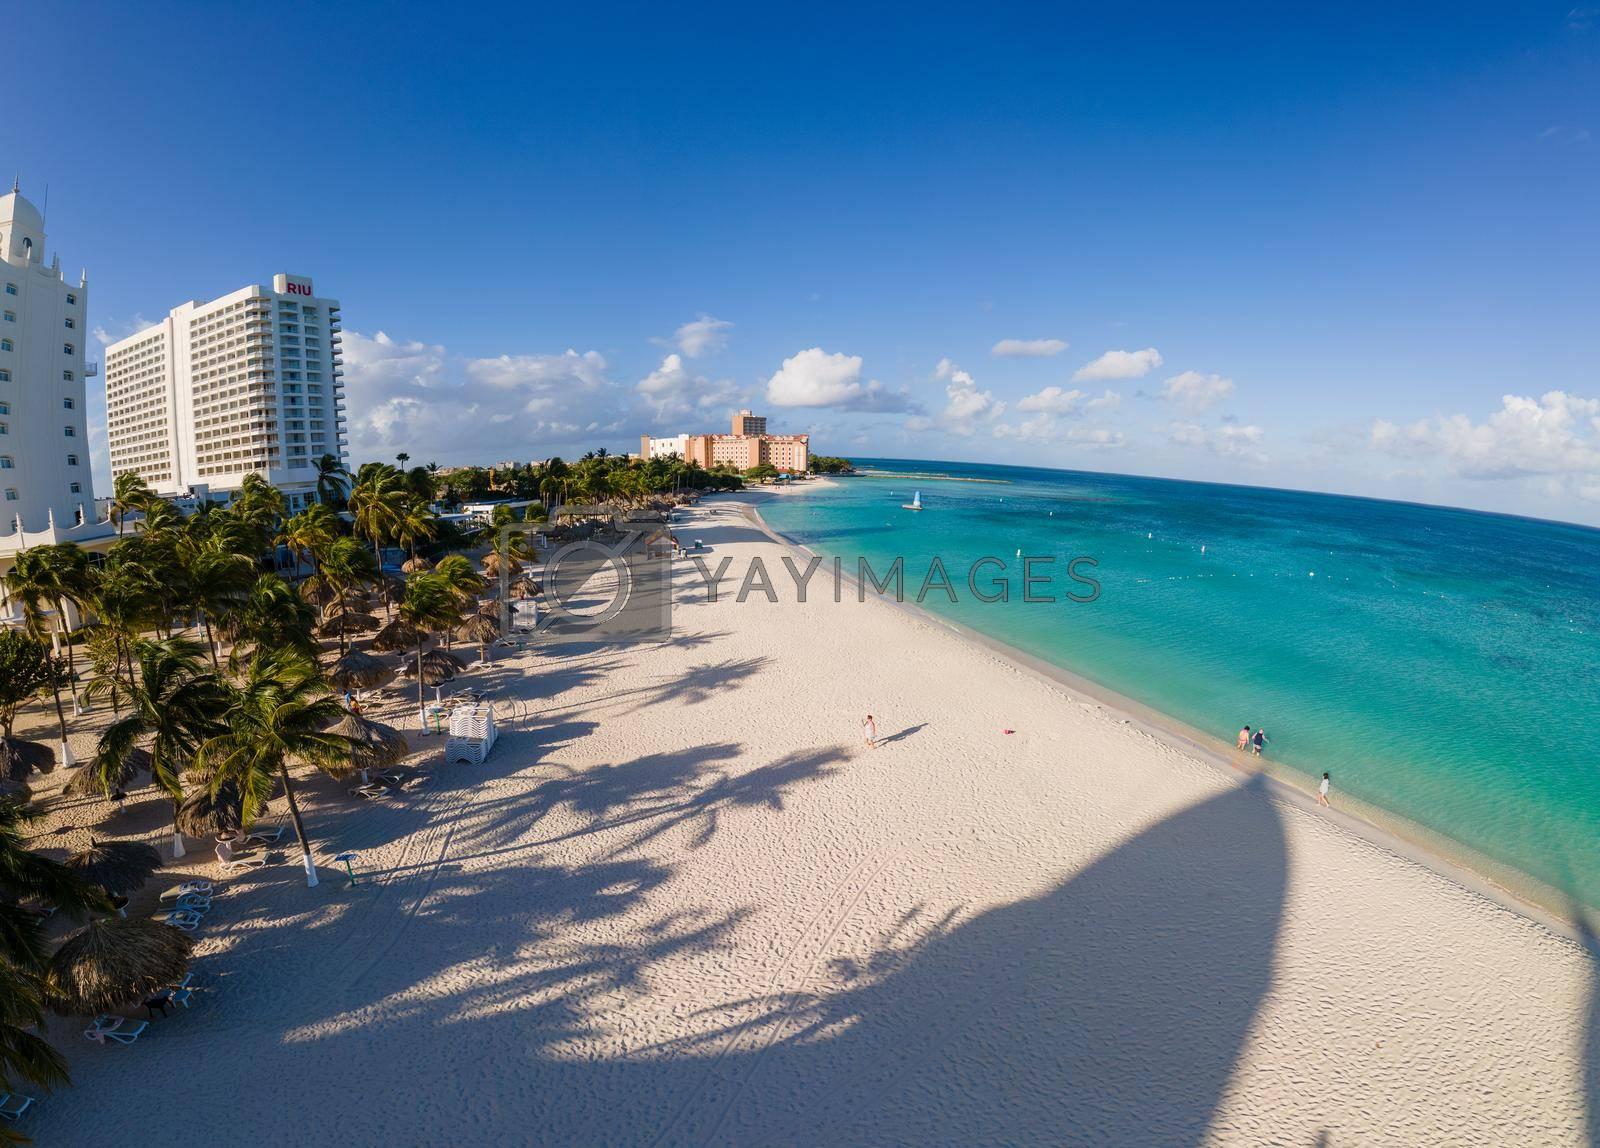 Aruba March 2021, Luxury hotels at Palm Beach Aruba Caribbean